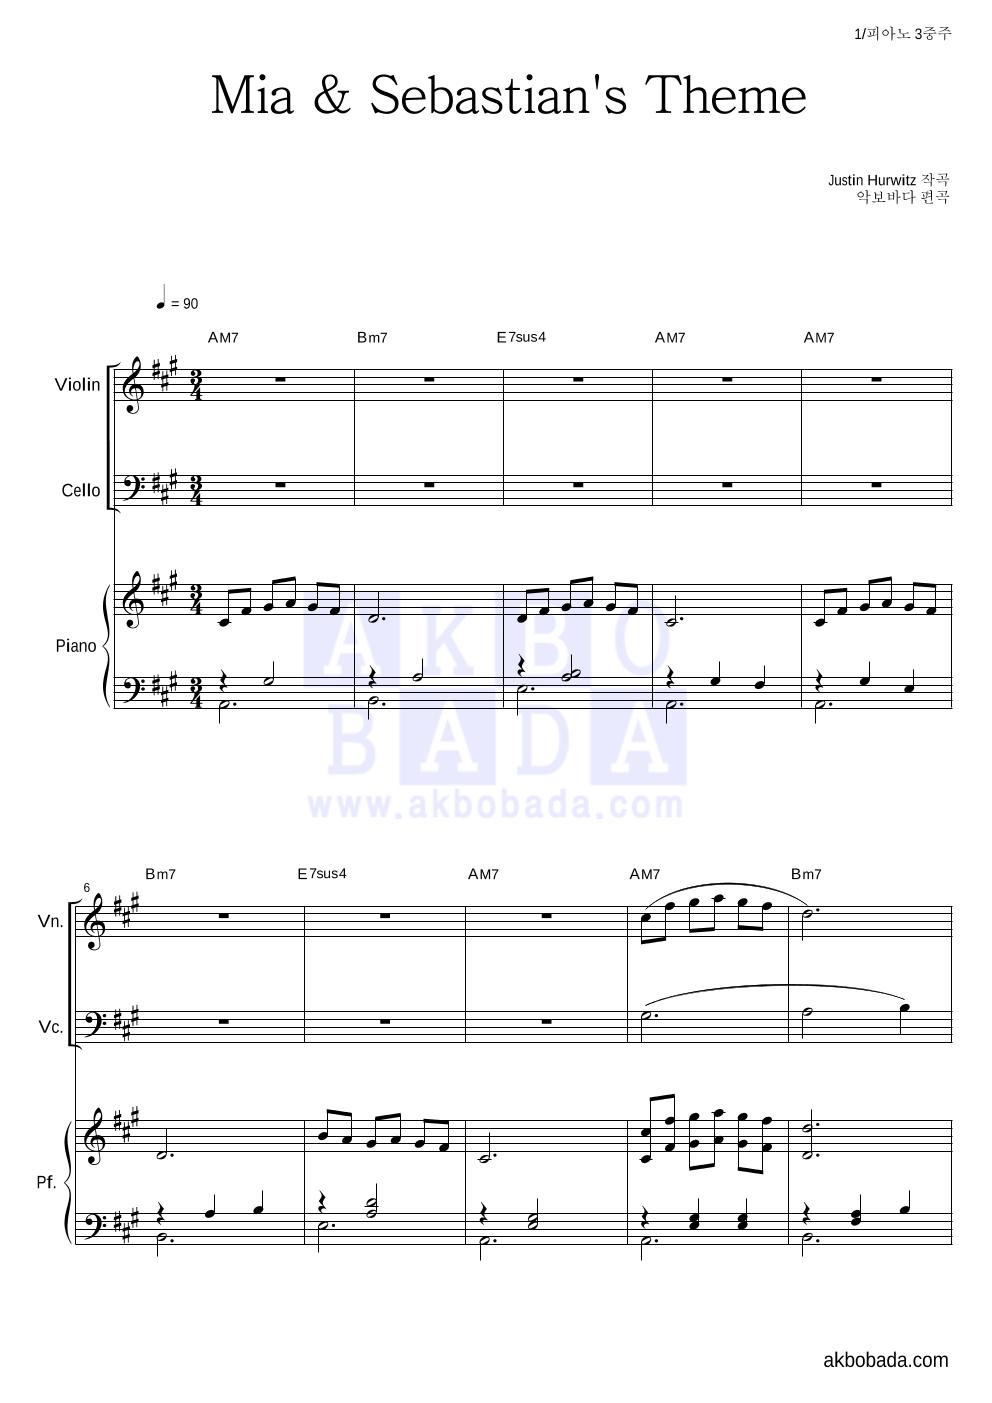 Justin Hurwitz - Mia & Sebastian's Theme 피아노3중주 악보